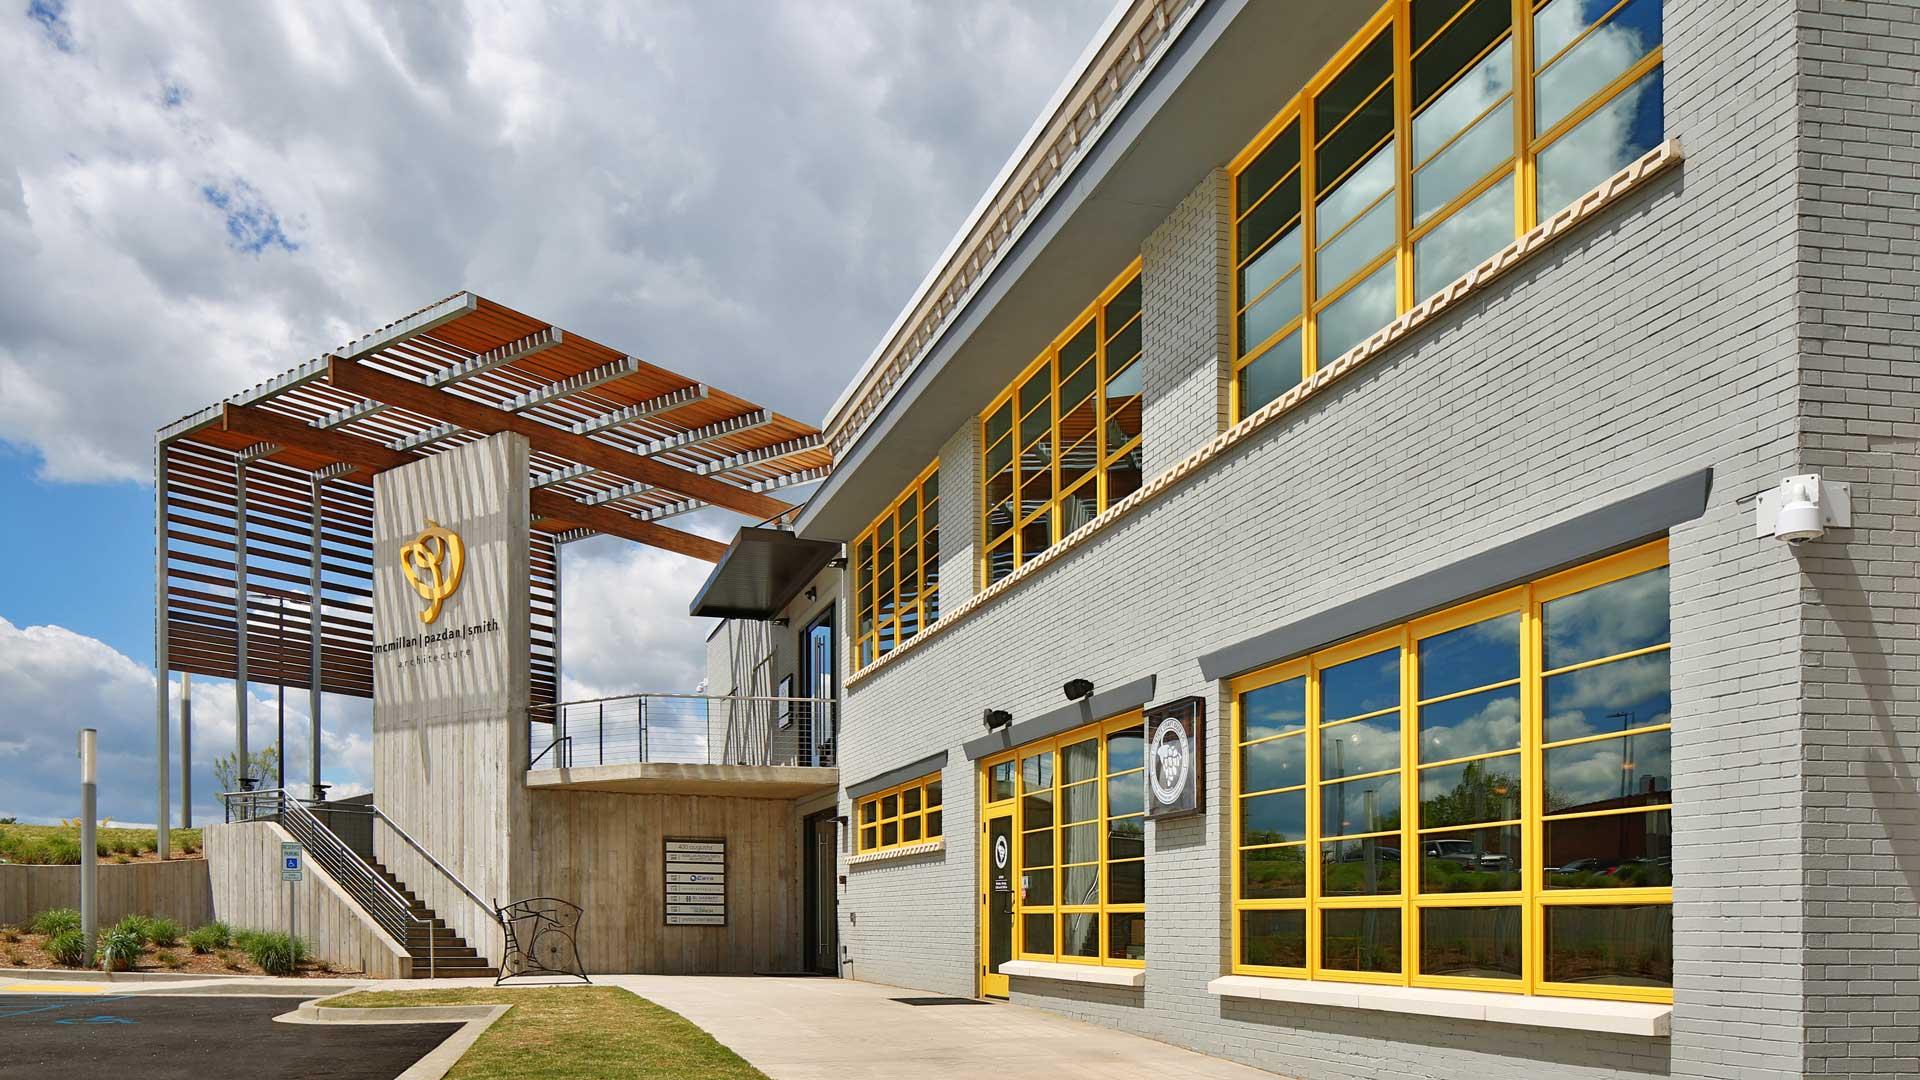 Claussen Bakery, Adapative Reuse, Exterior